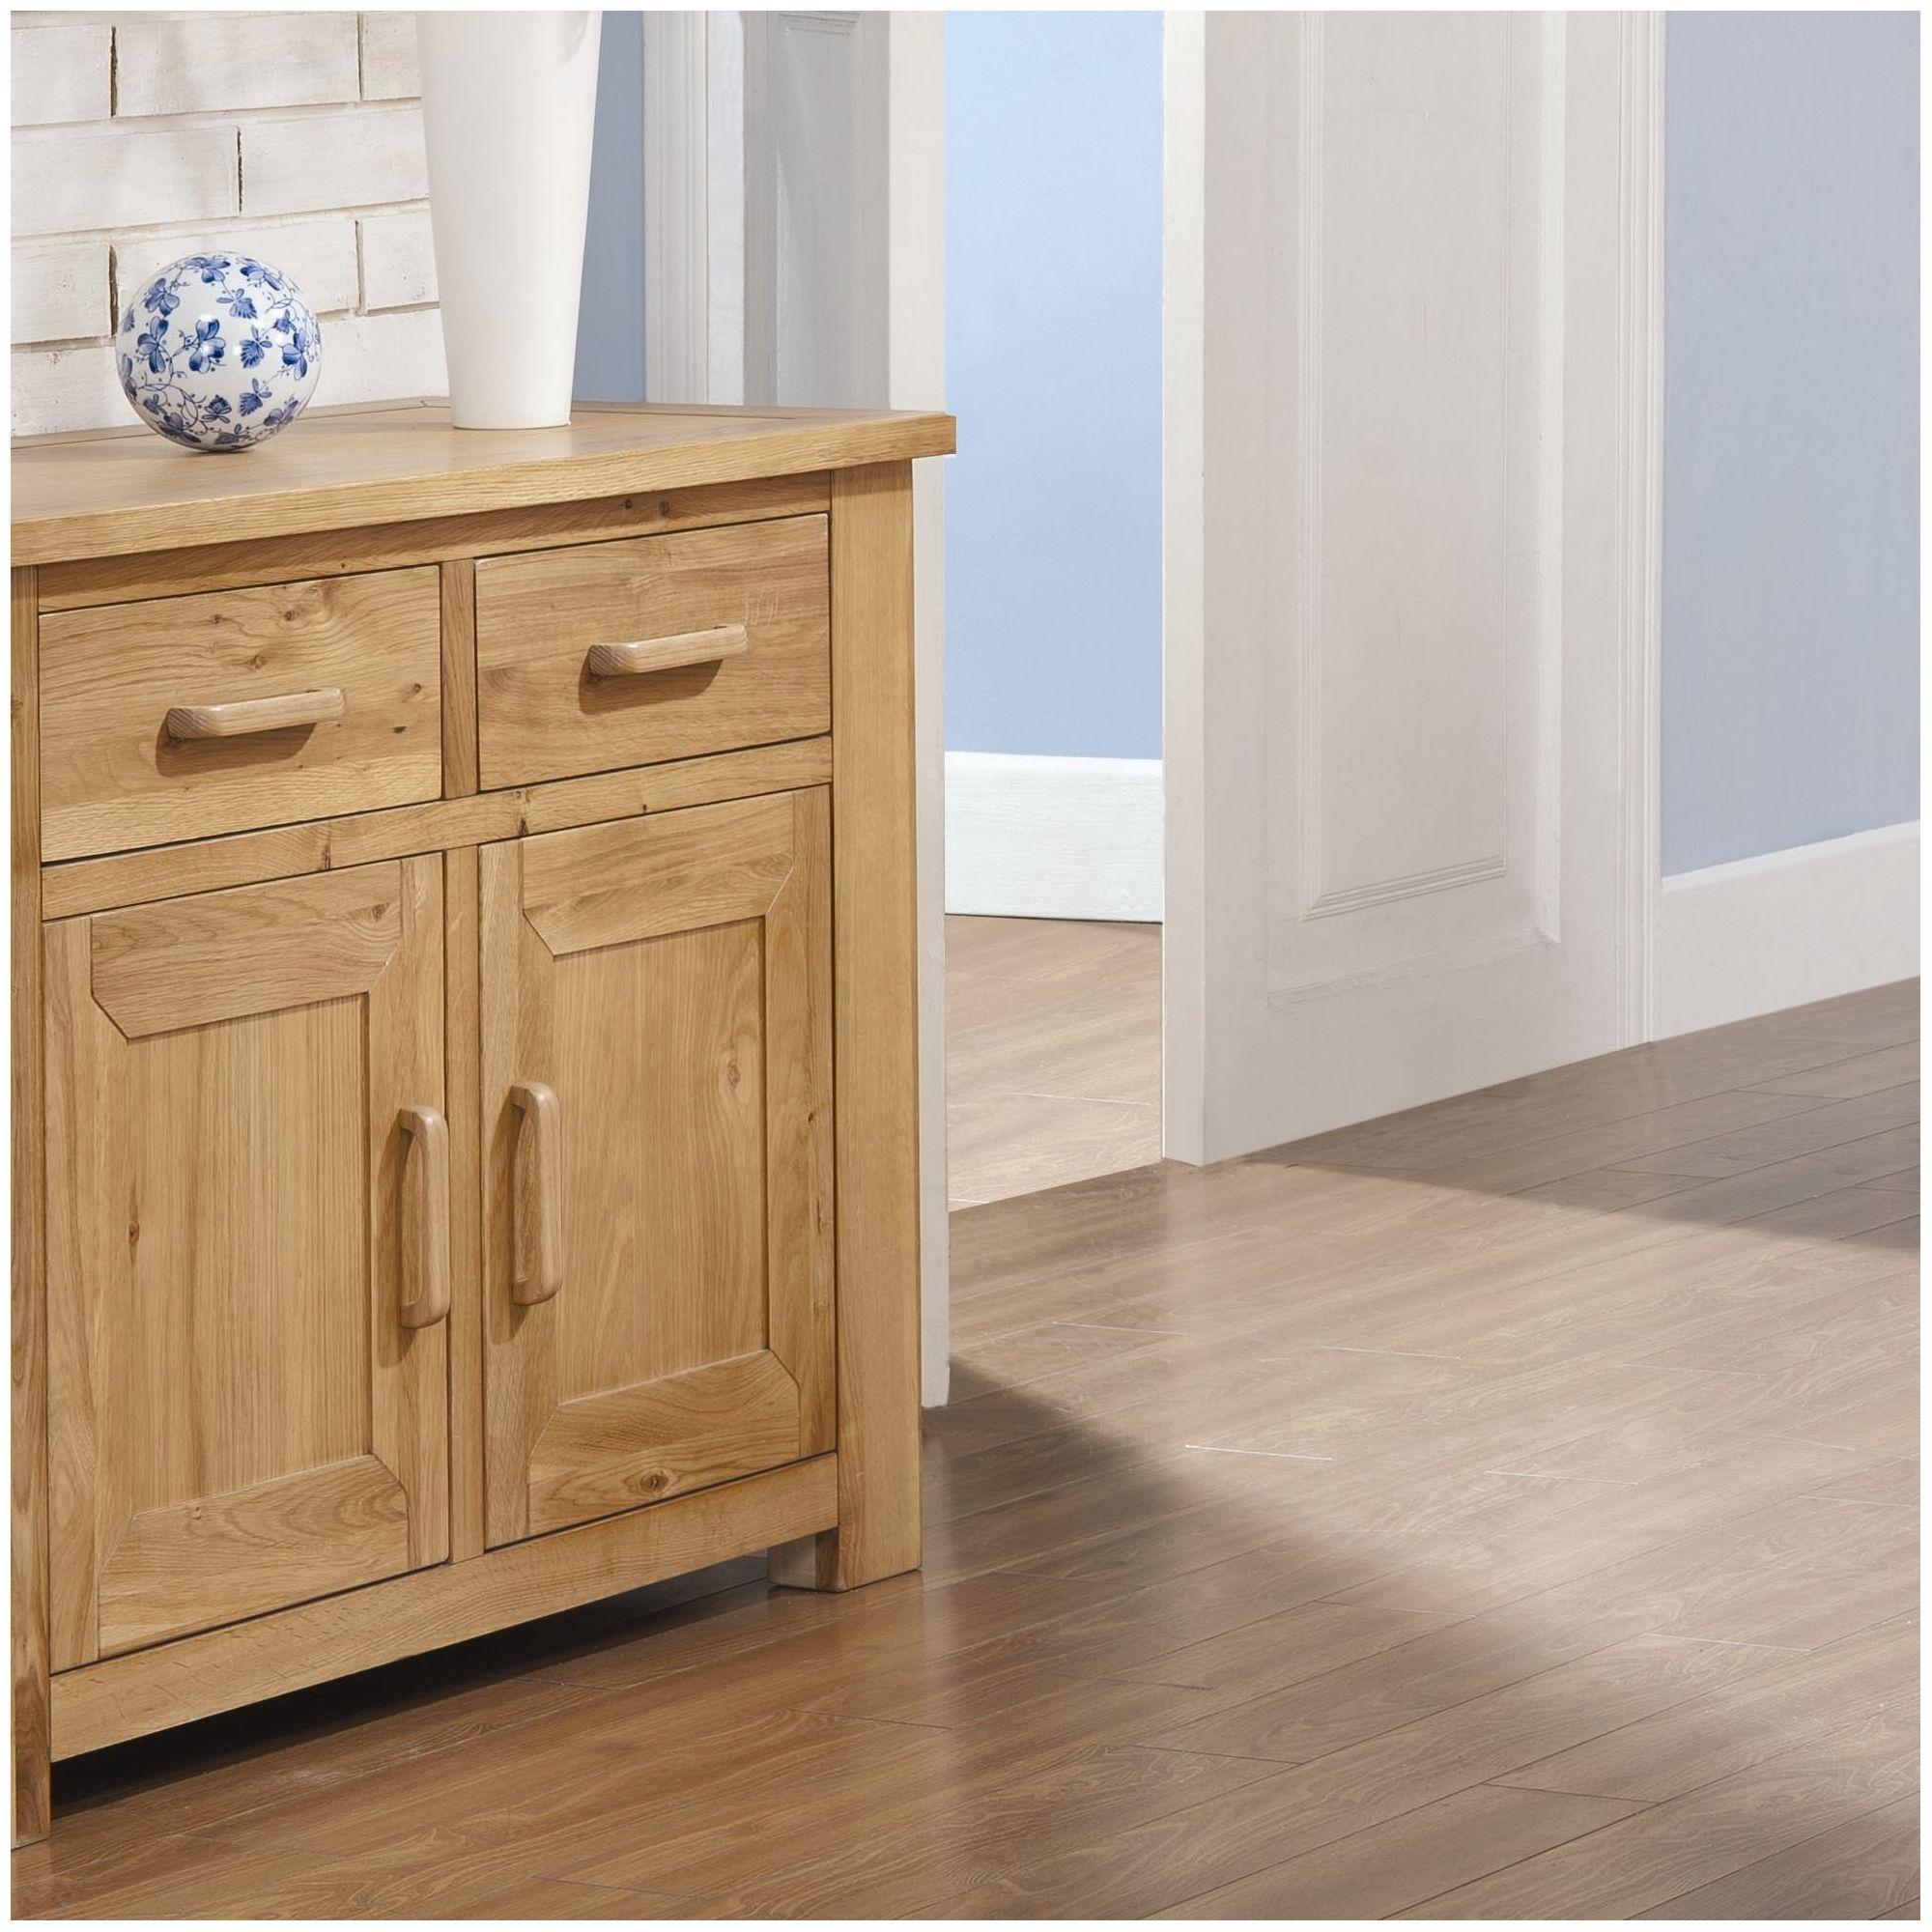 Alterton Furniture Wiltshire Oak Mini Sideboard at Tesco Direct